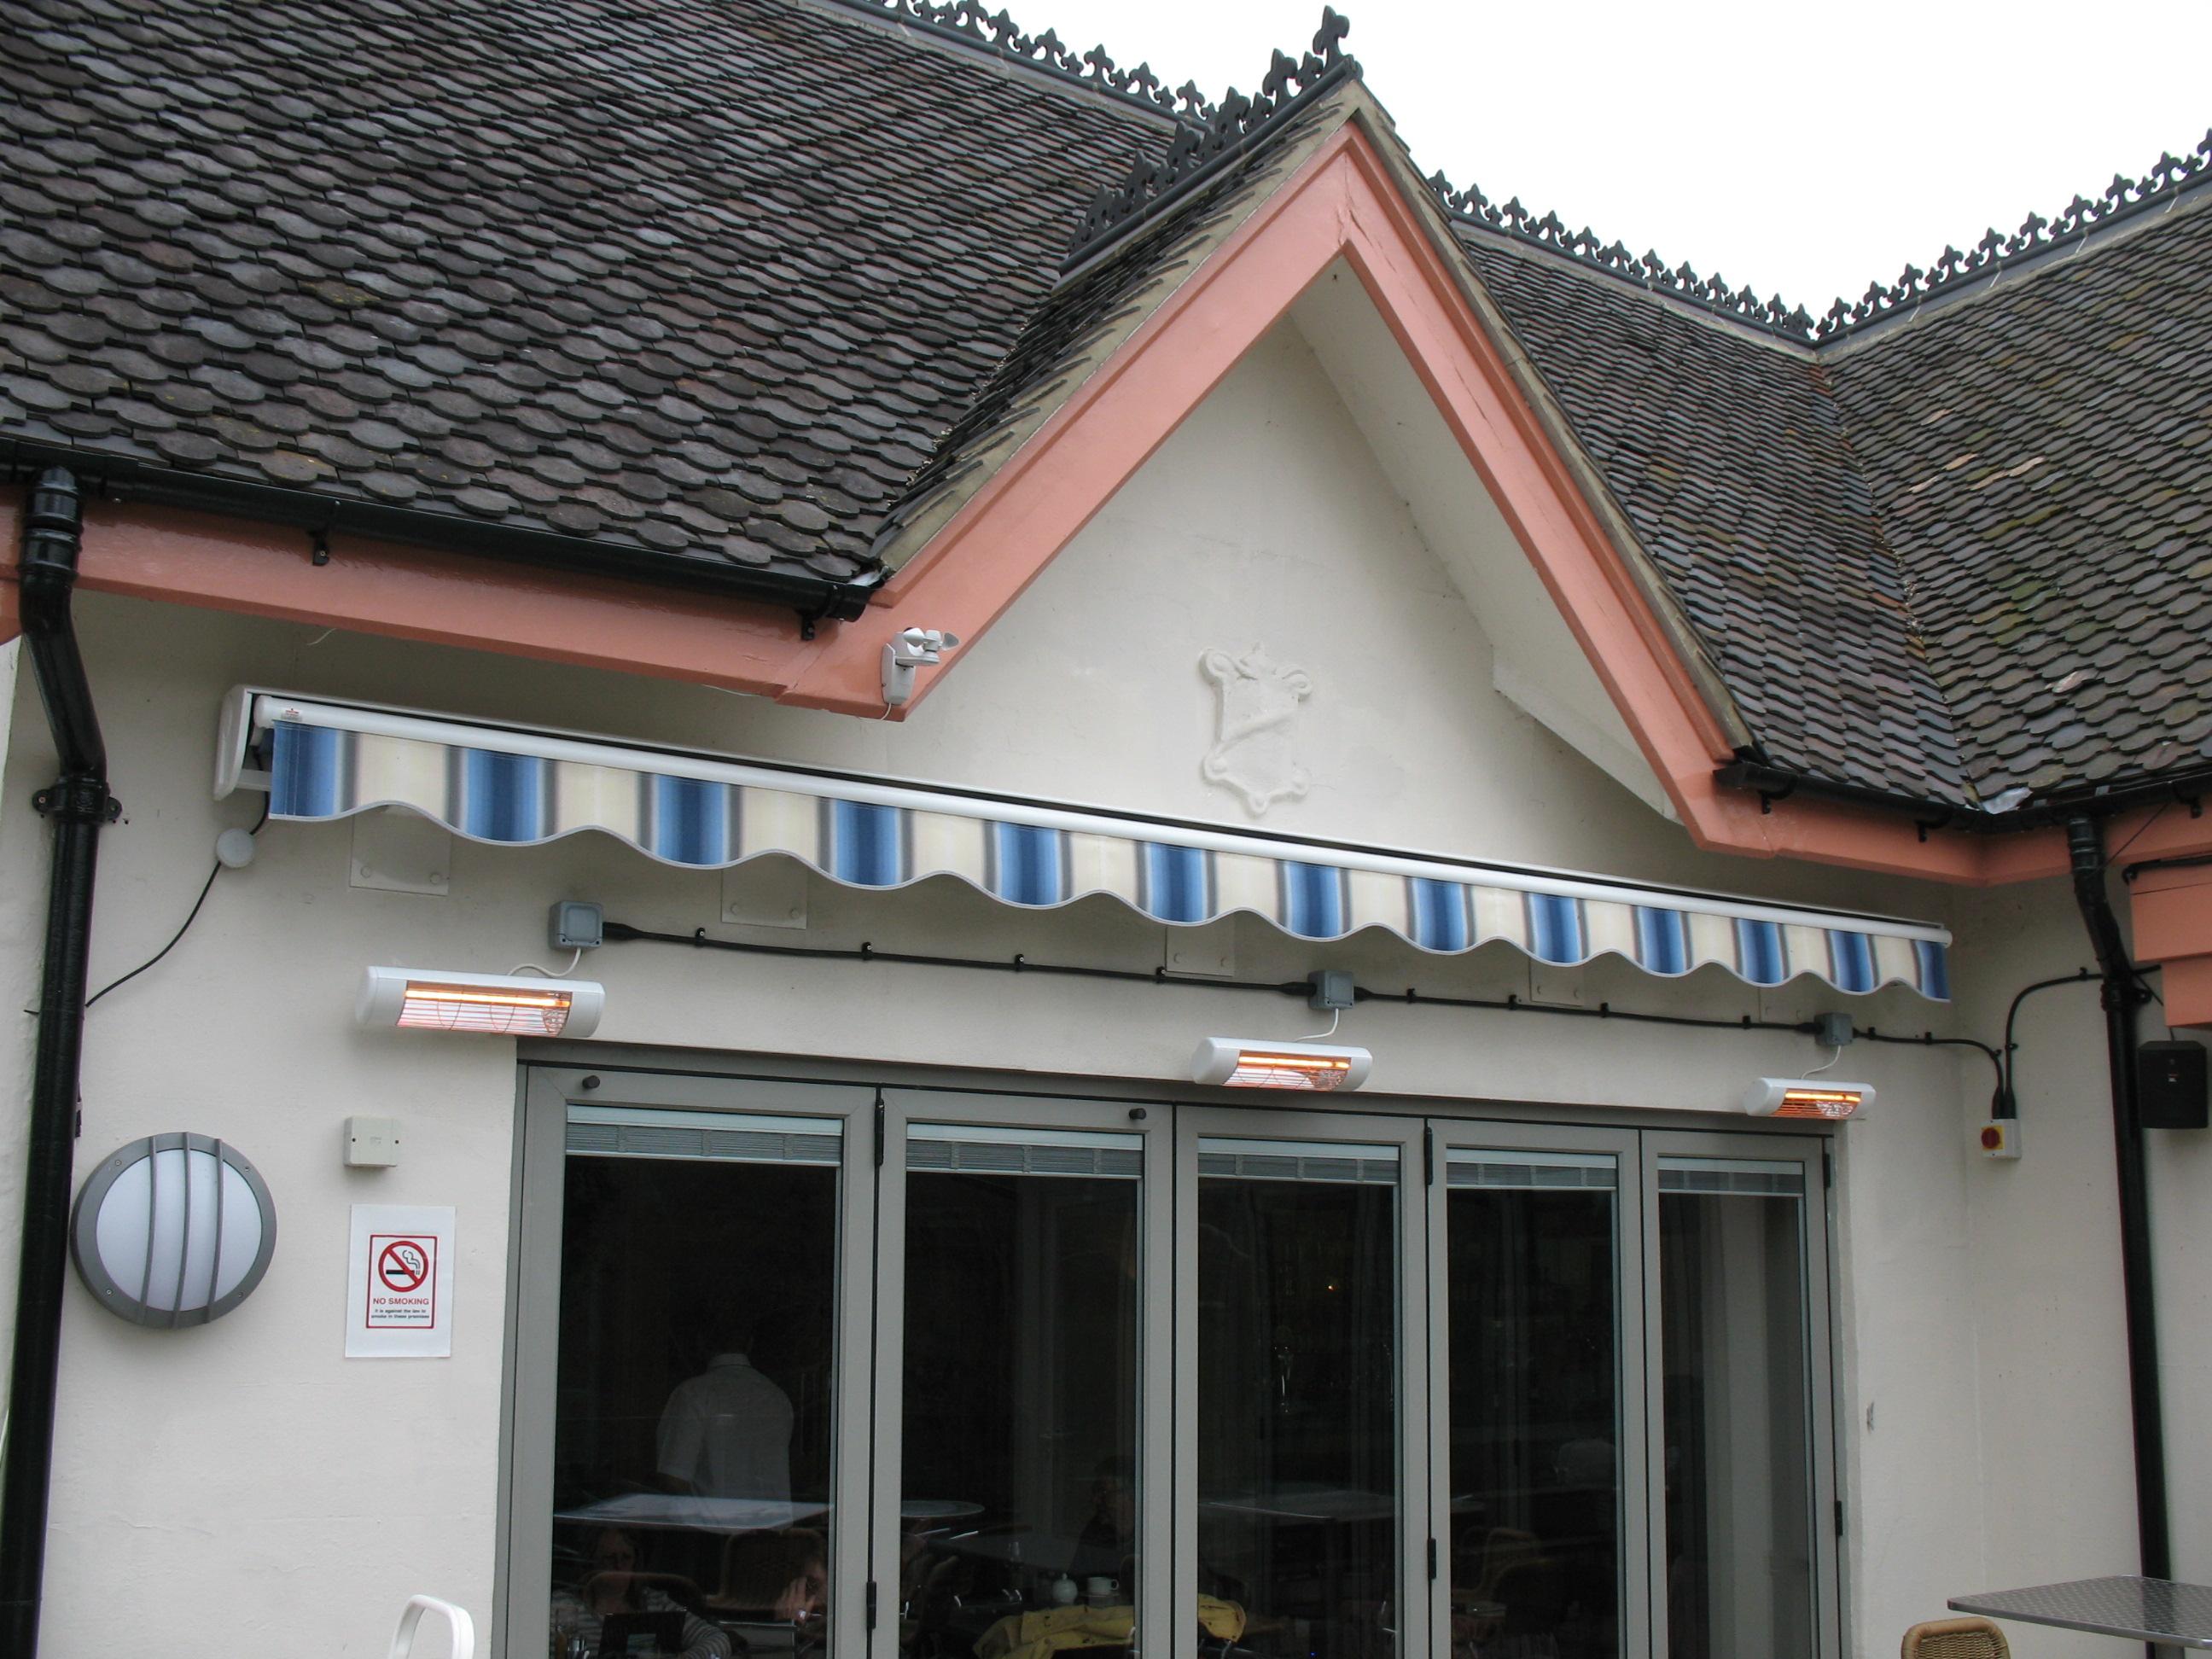 Calentadores-infrarrojos-pared